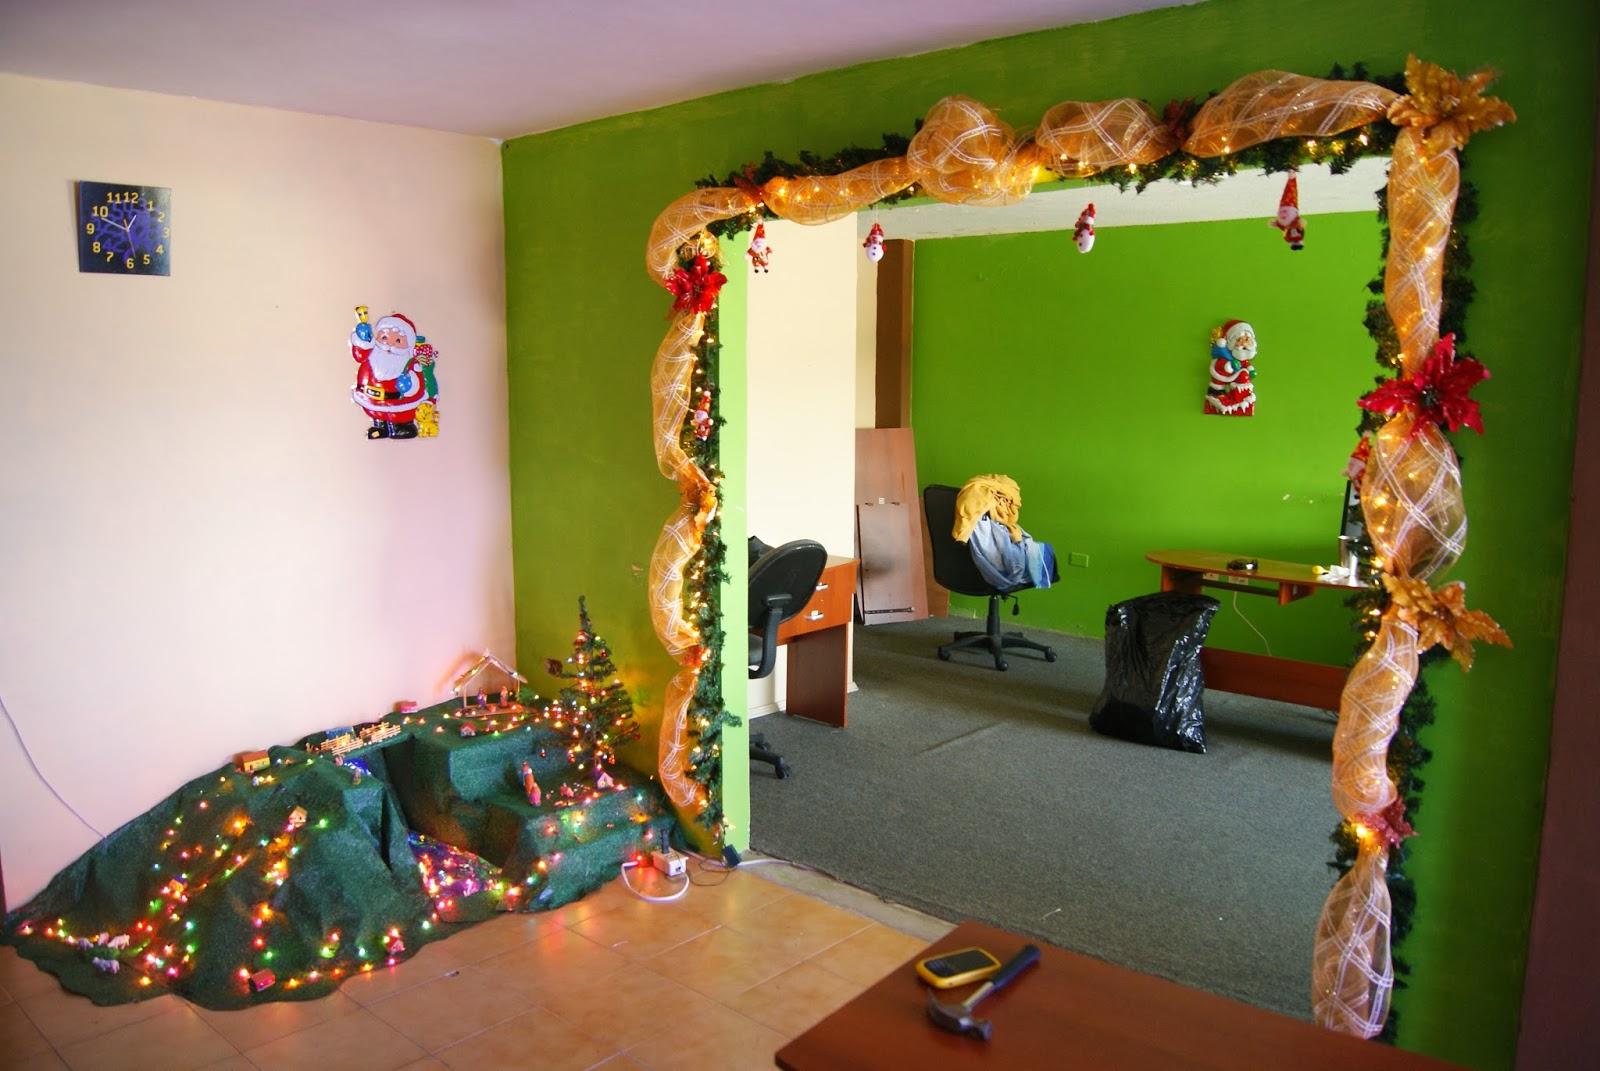 Megaoffice Viste De Navidad Tu Oficina